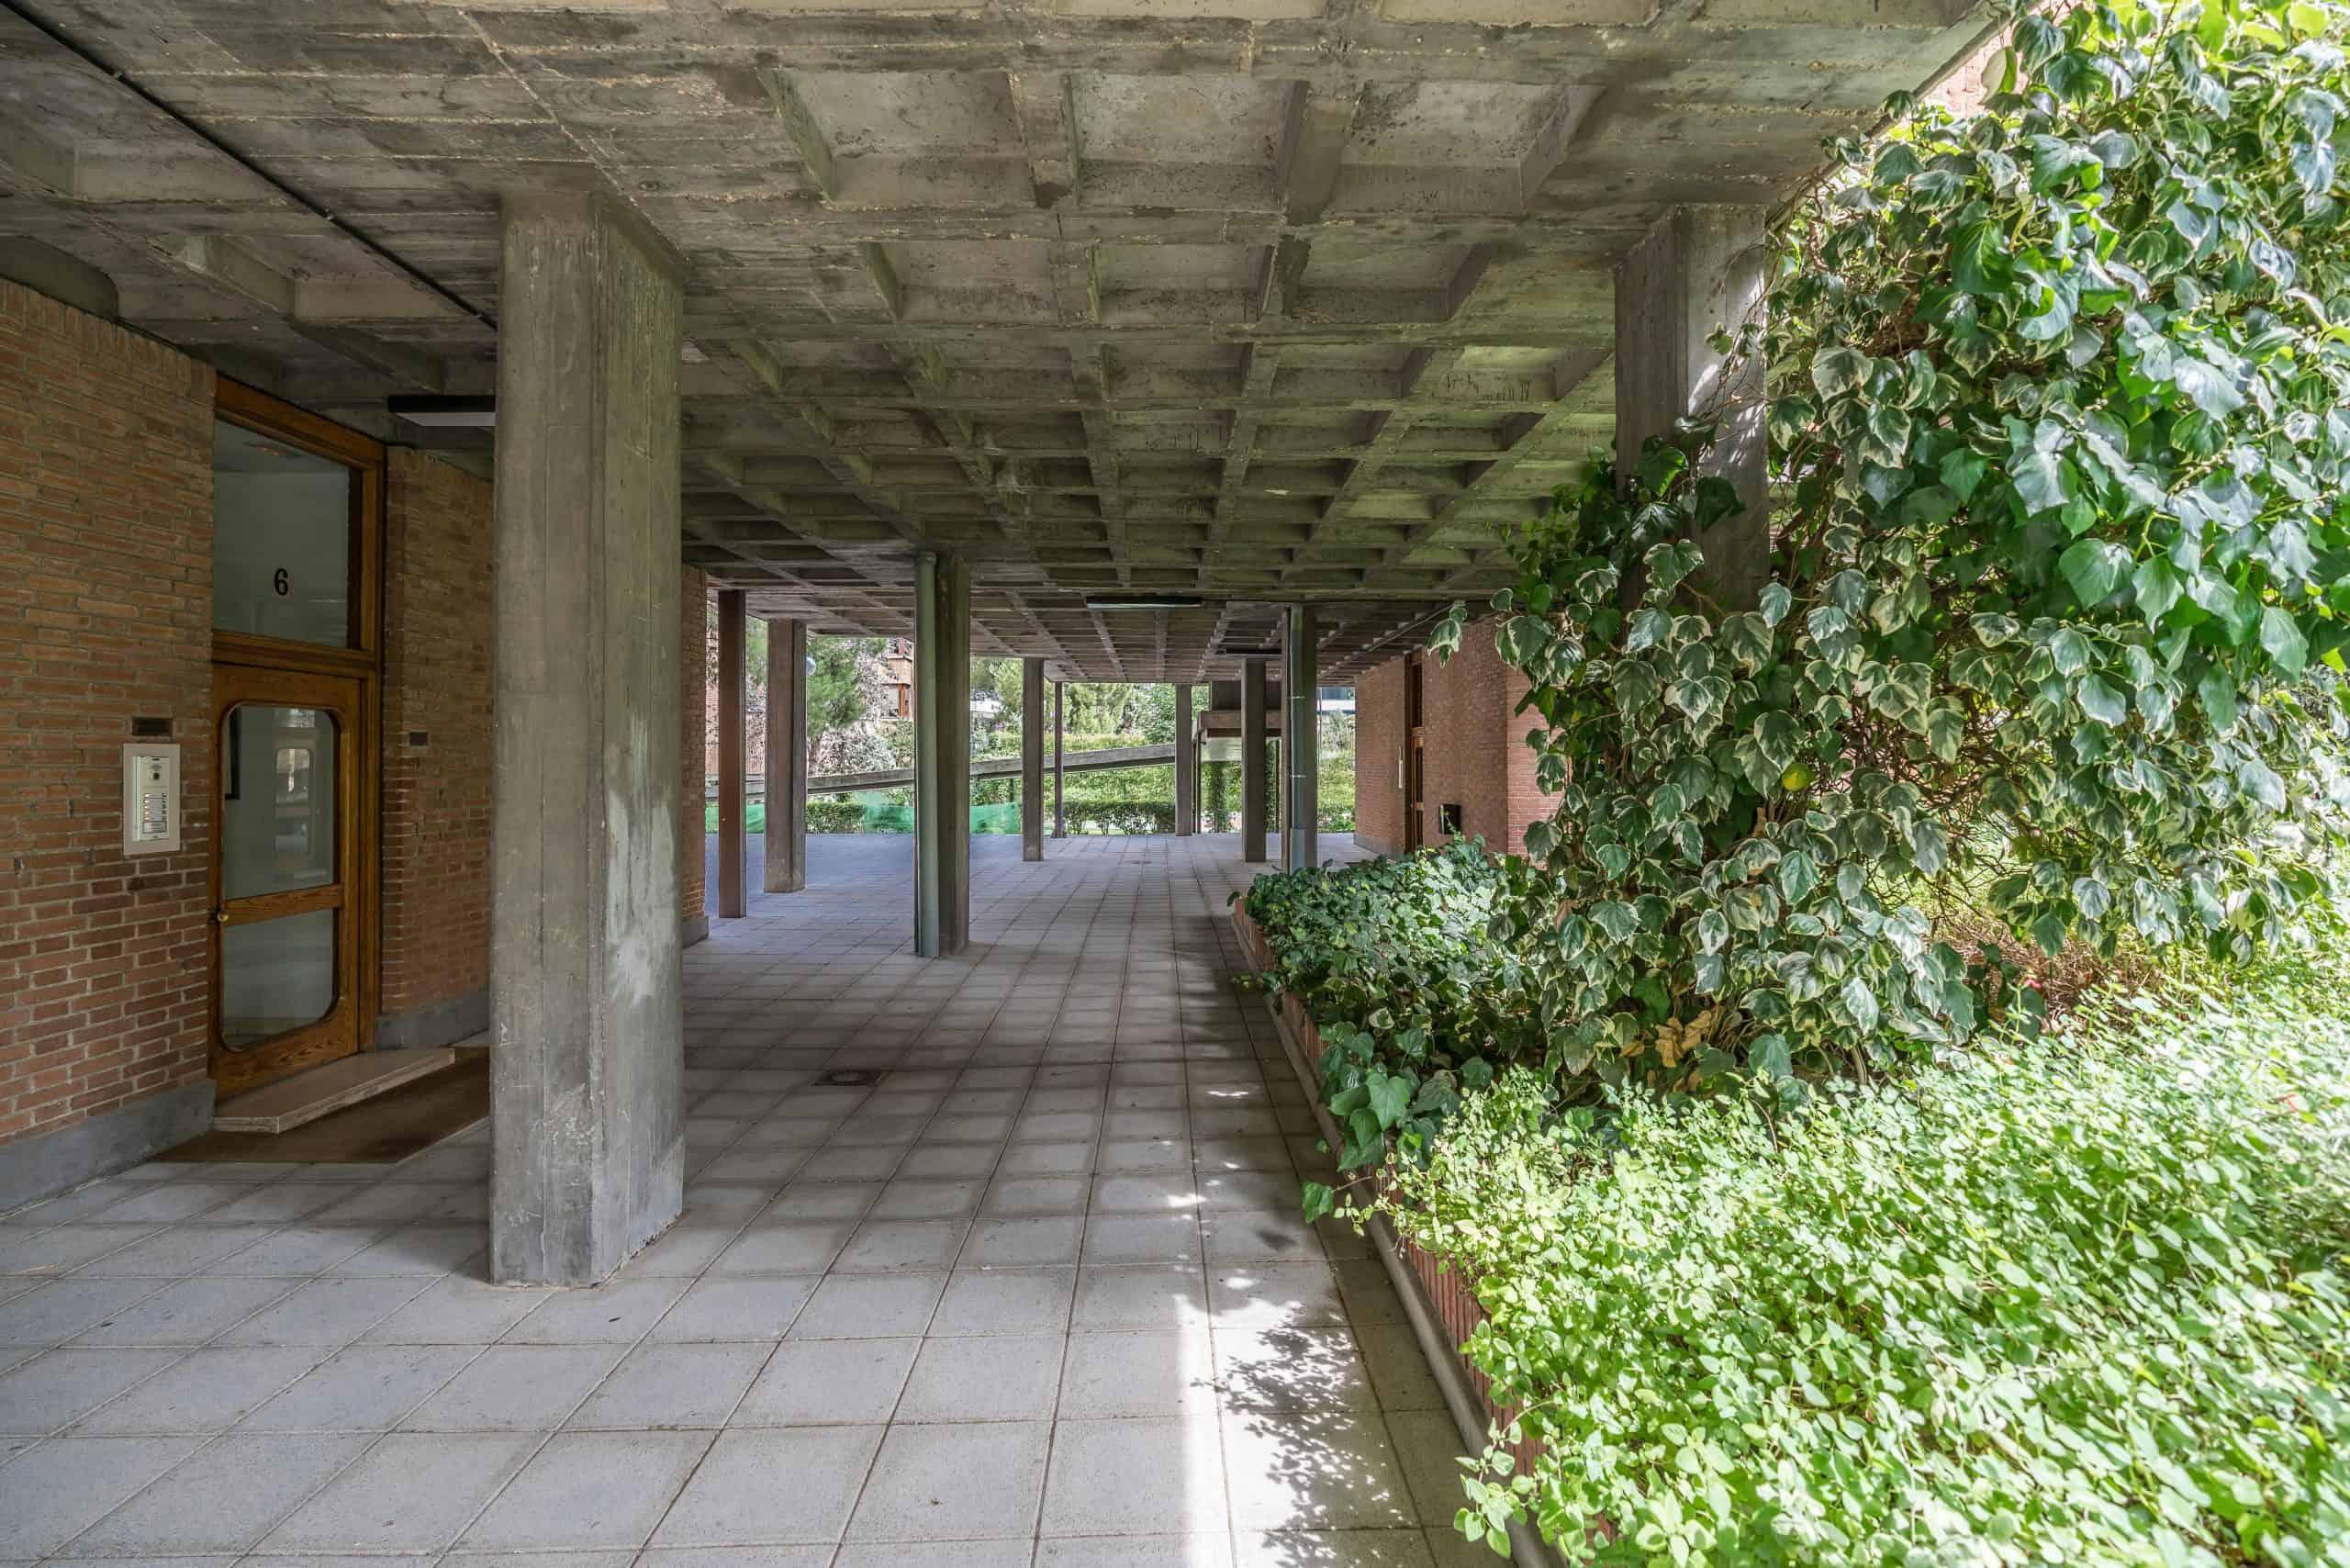 Agencia Inmobiliaria de Madrid-FUTUROCASA-Zona ARGANZUELA-EMBAJADORES-LEGAZPI -calle Embajadores- baño 183